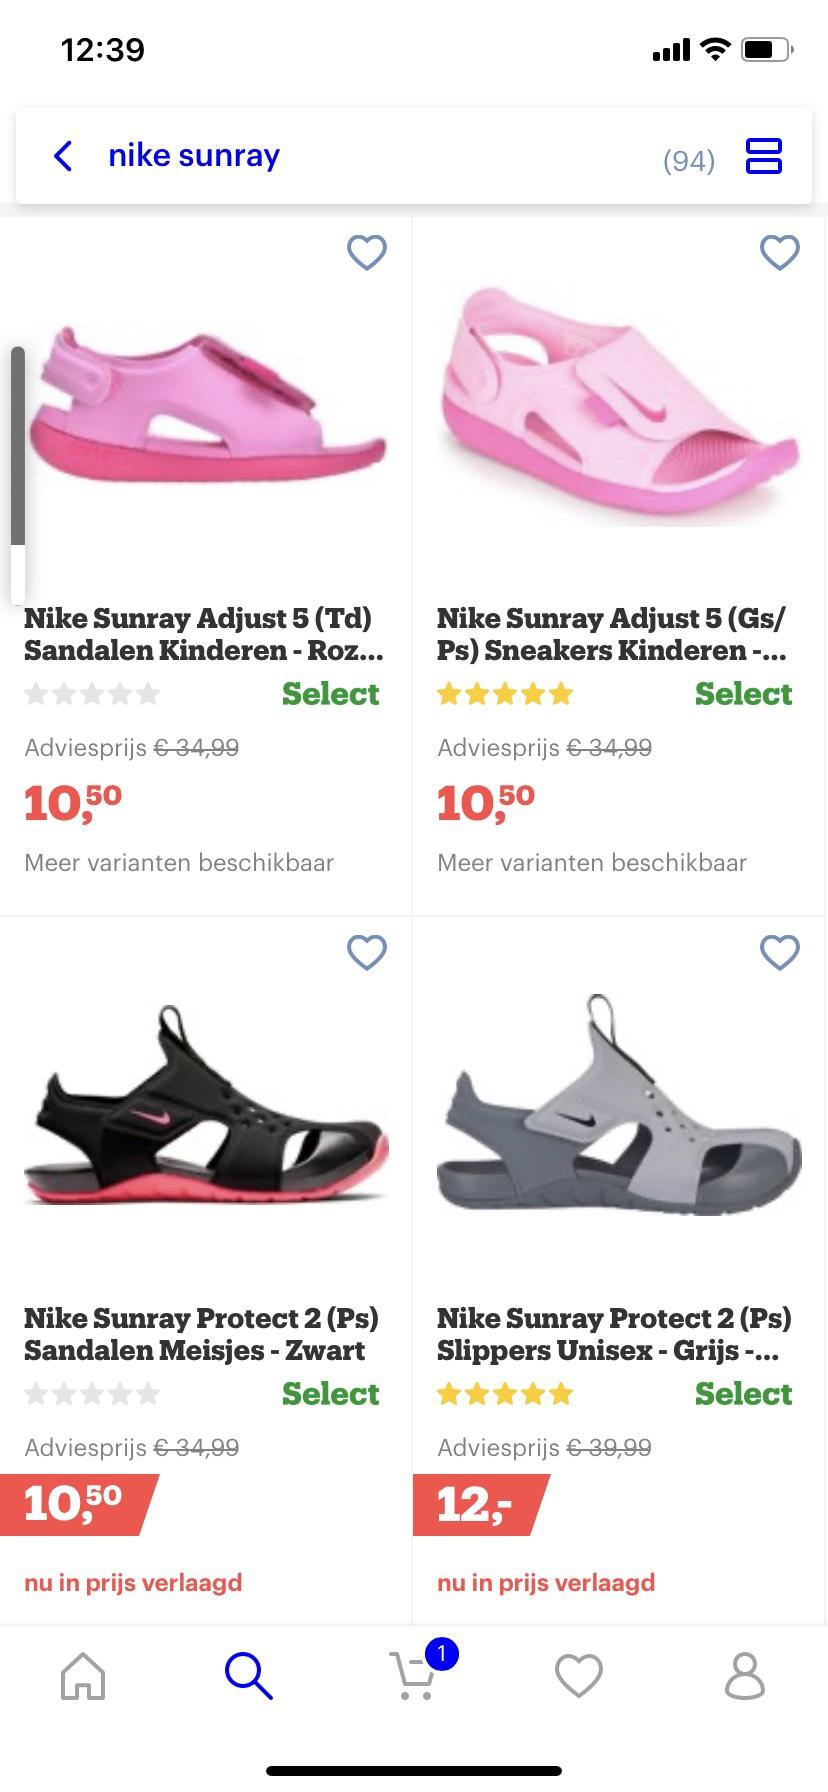 Nike sunray schoenen met flinke korting bij bol